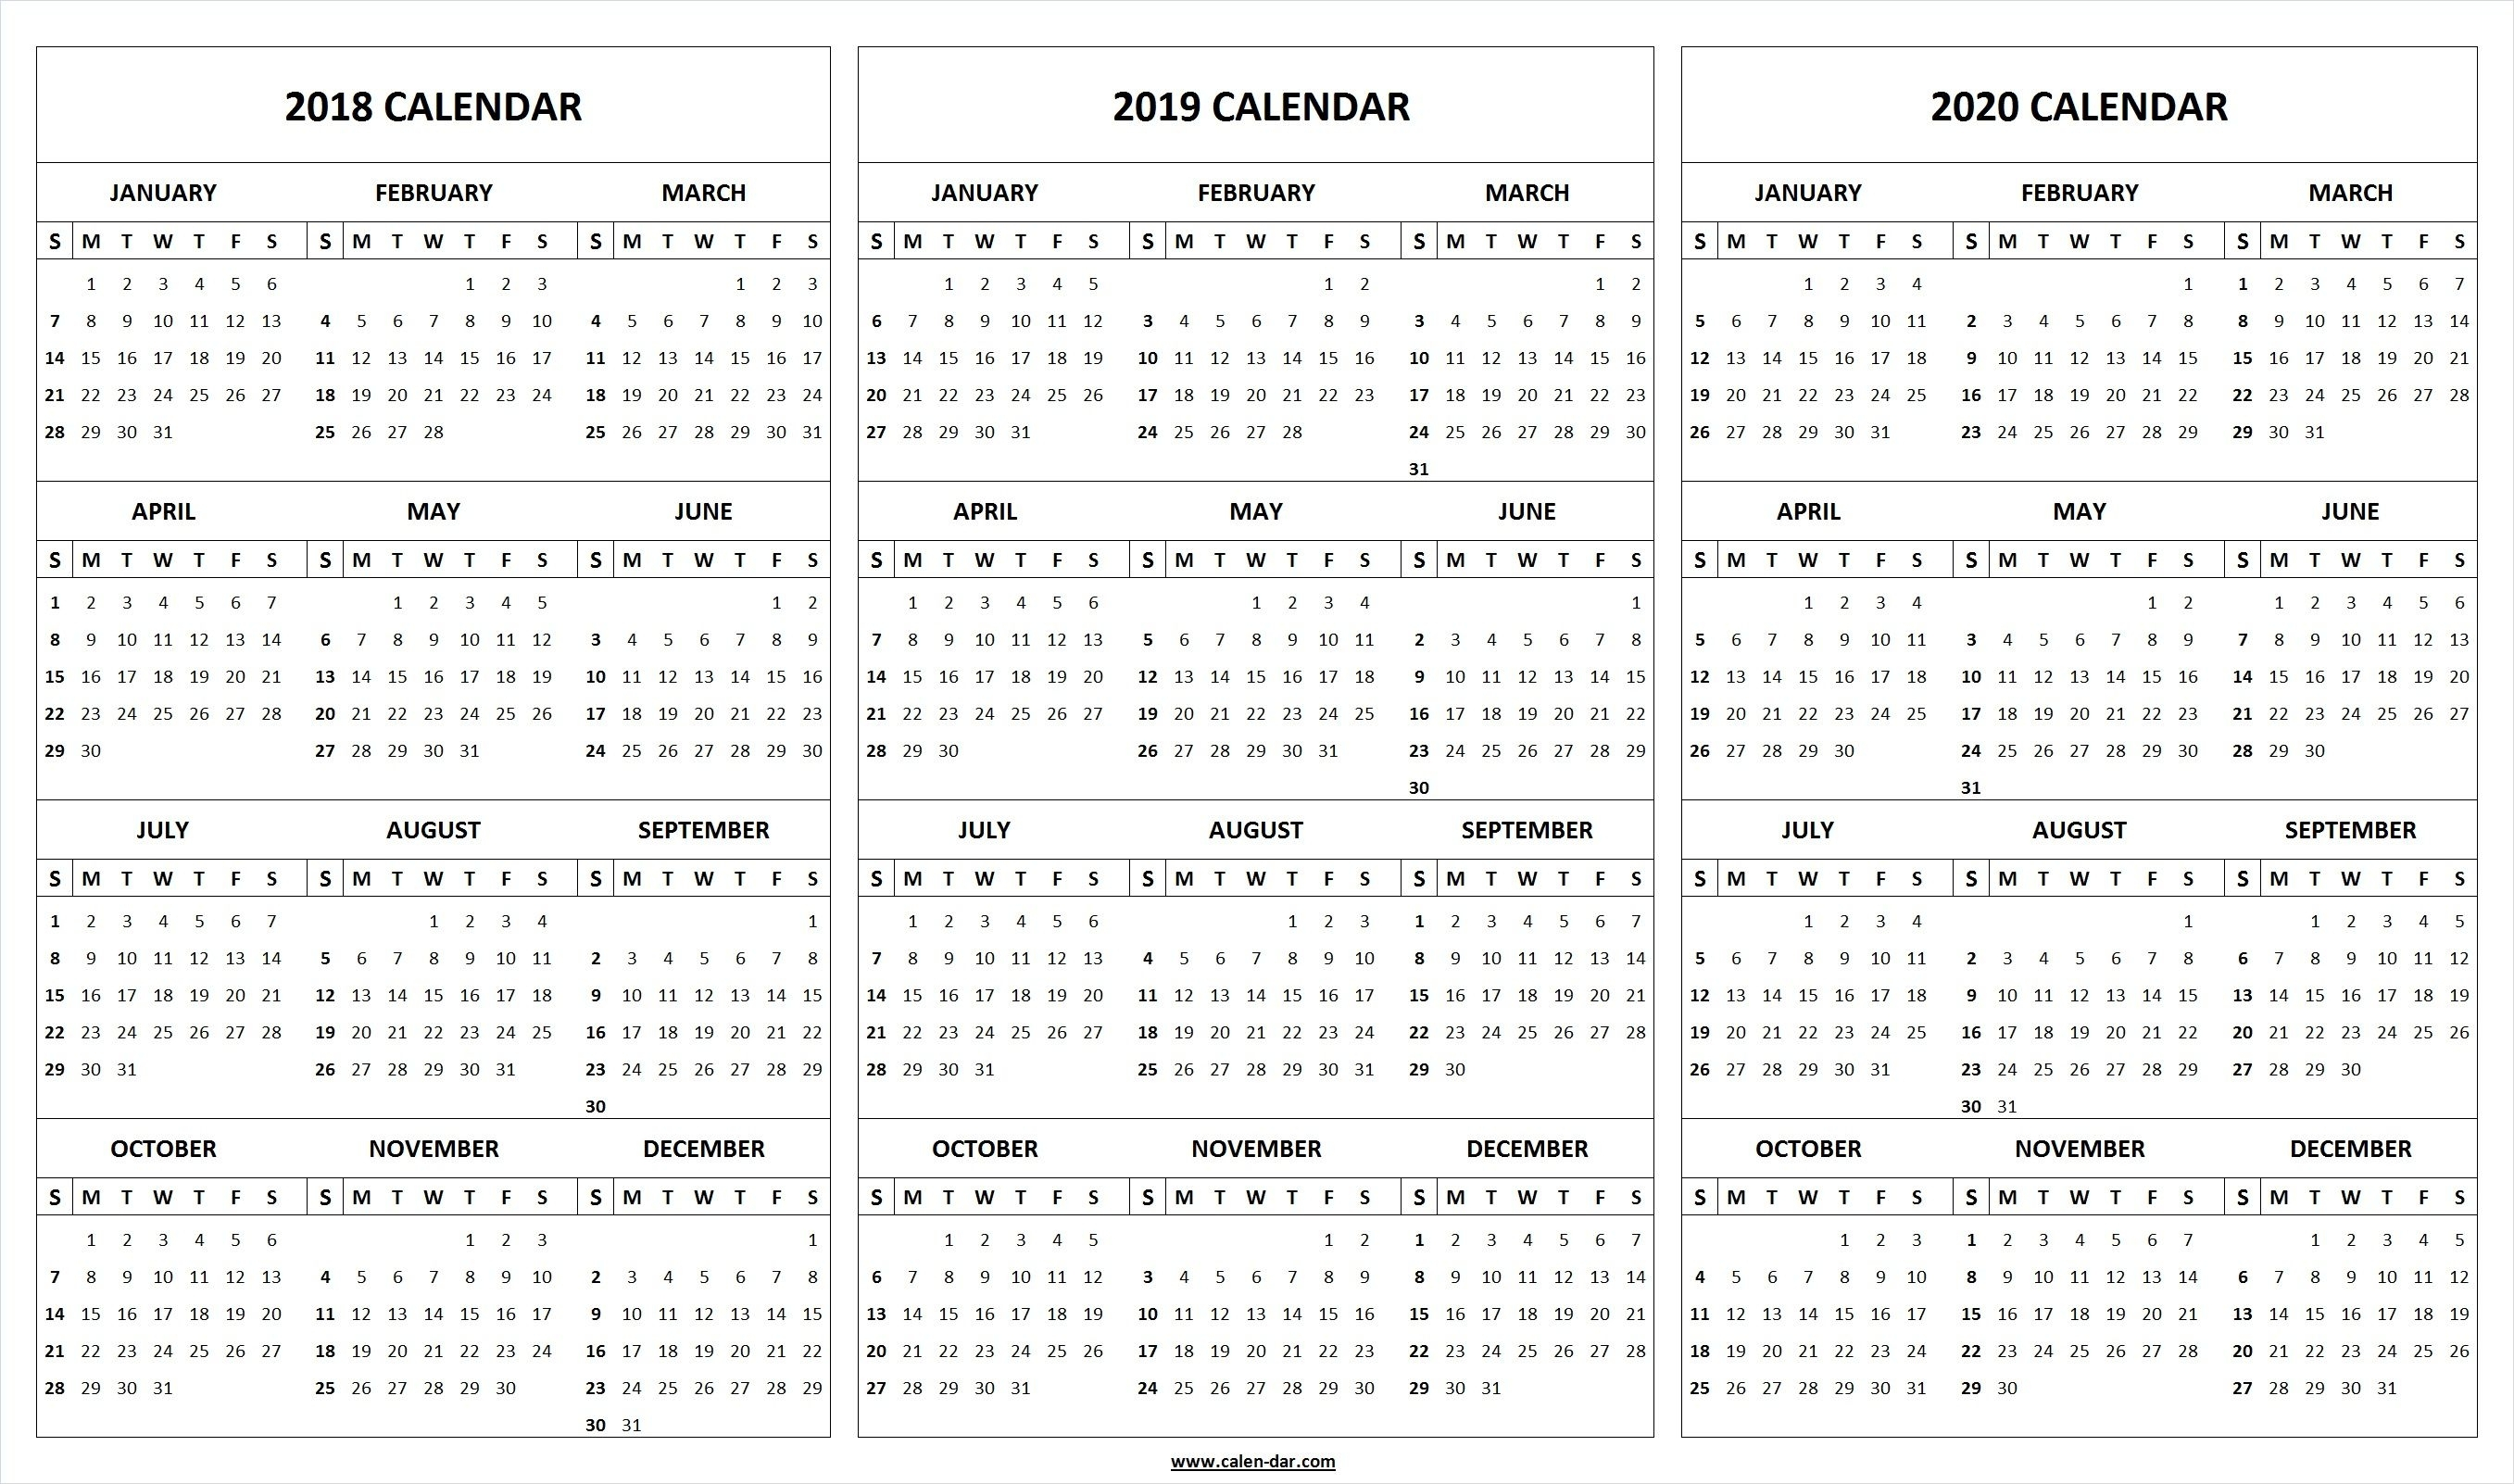 Print Blank 2018 2019 2020 Calendar Template | Organize! | Printable regarding 2019 And 2020 Calendar One Page